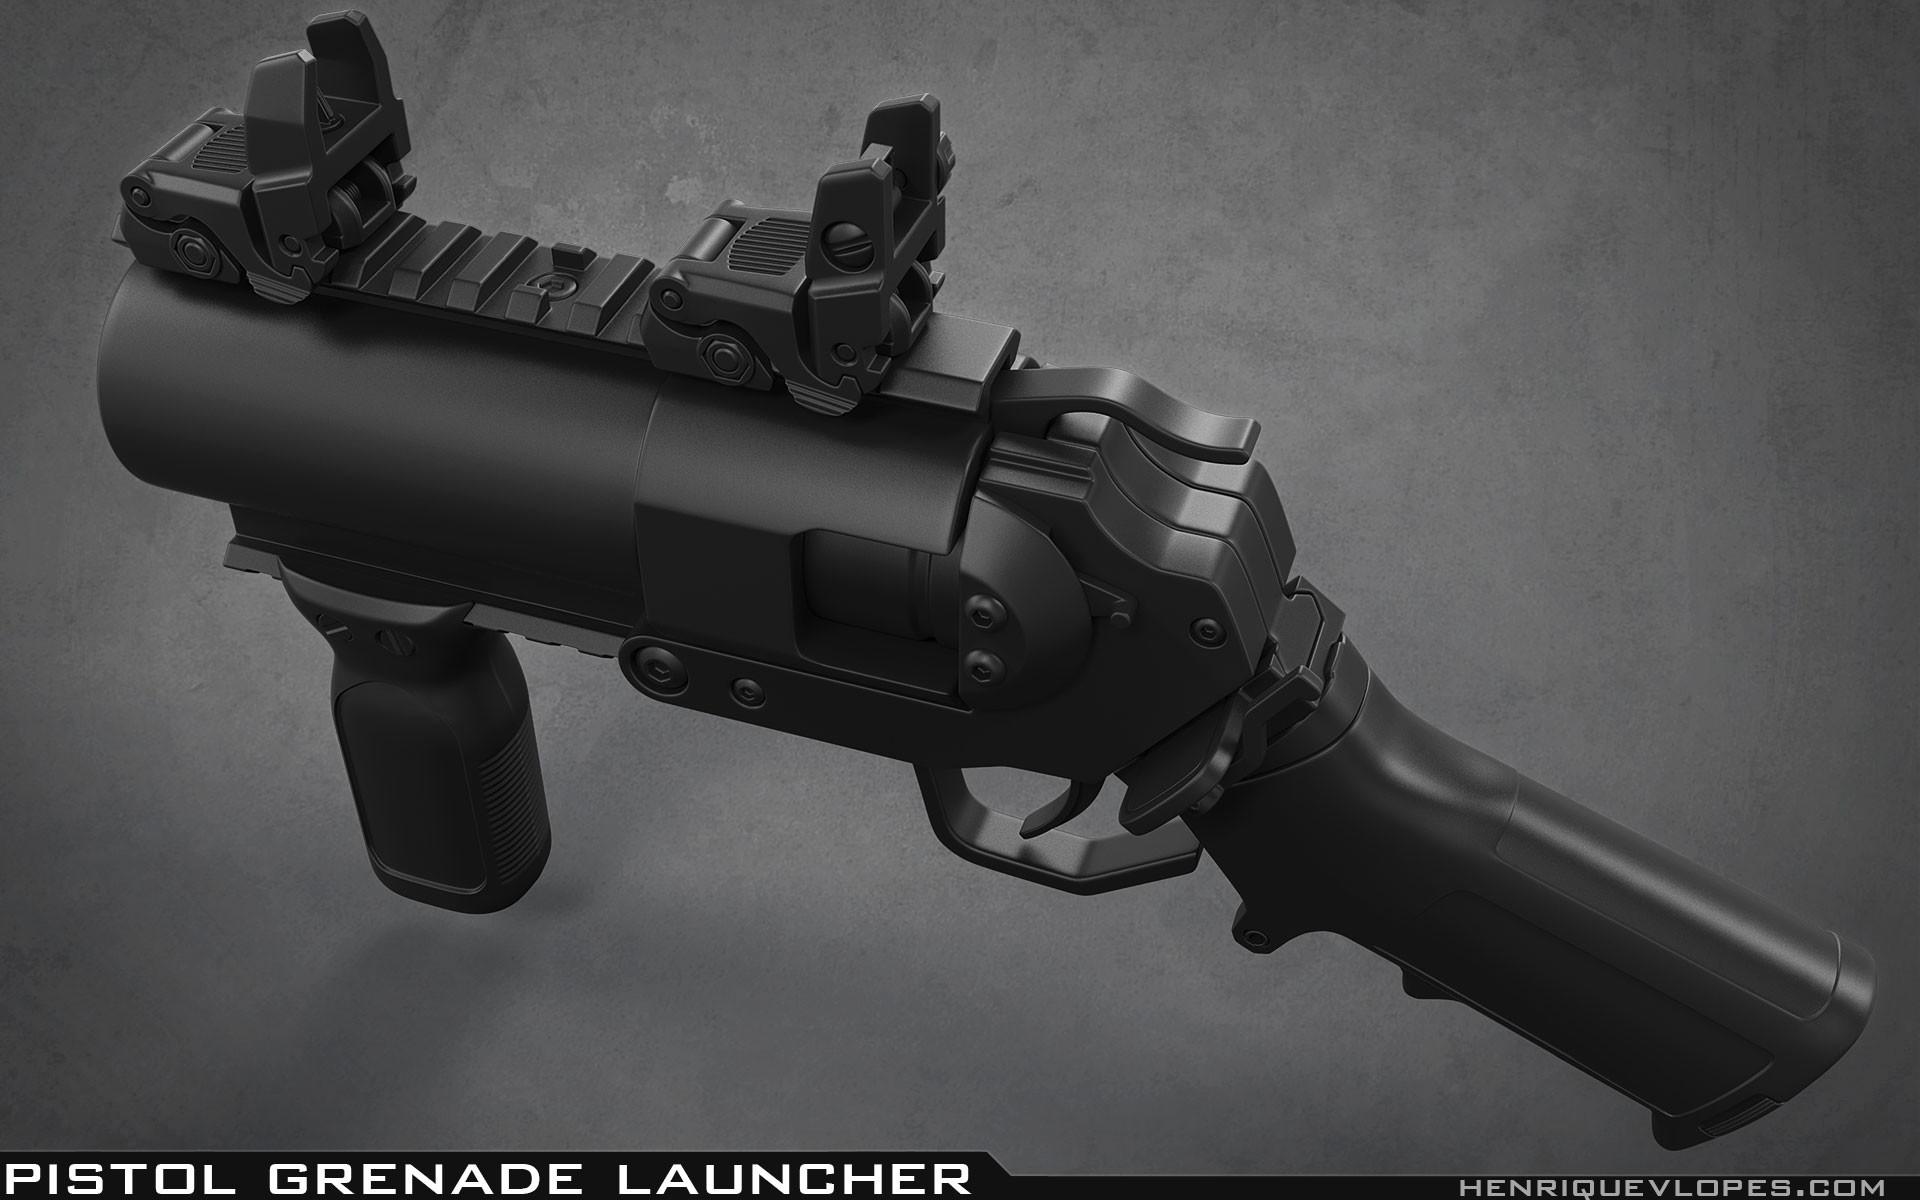 Henrique lopes pistol grenade launcher high 04